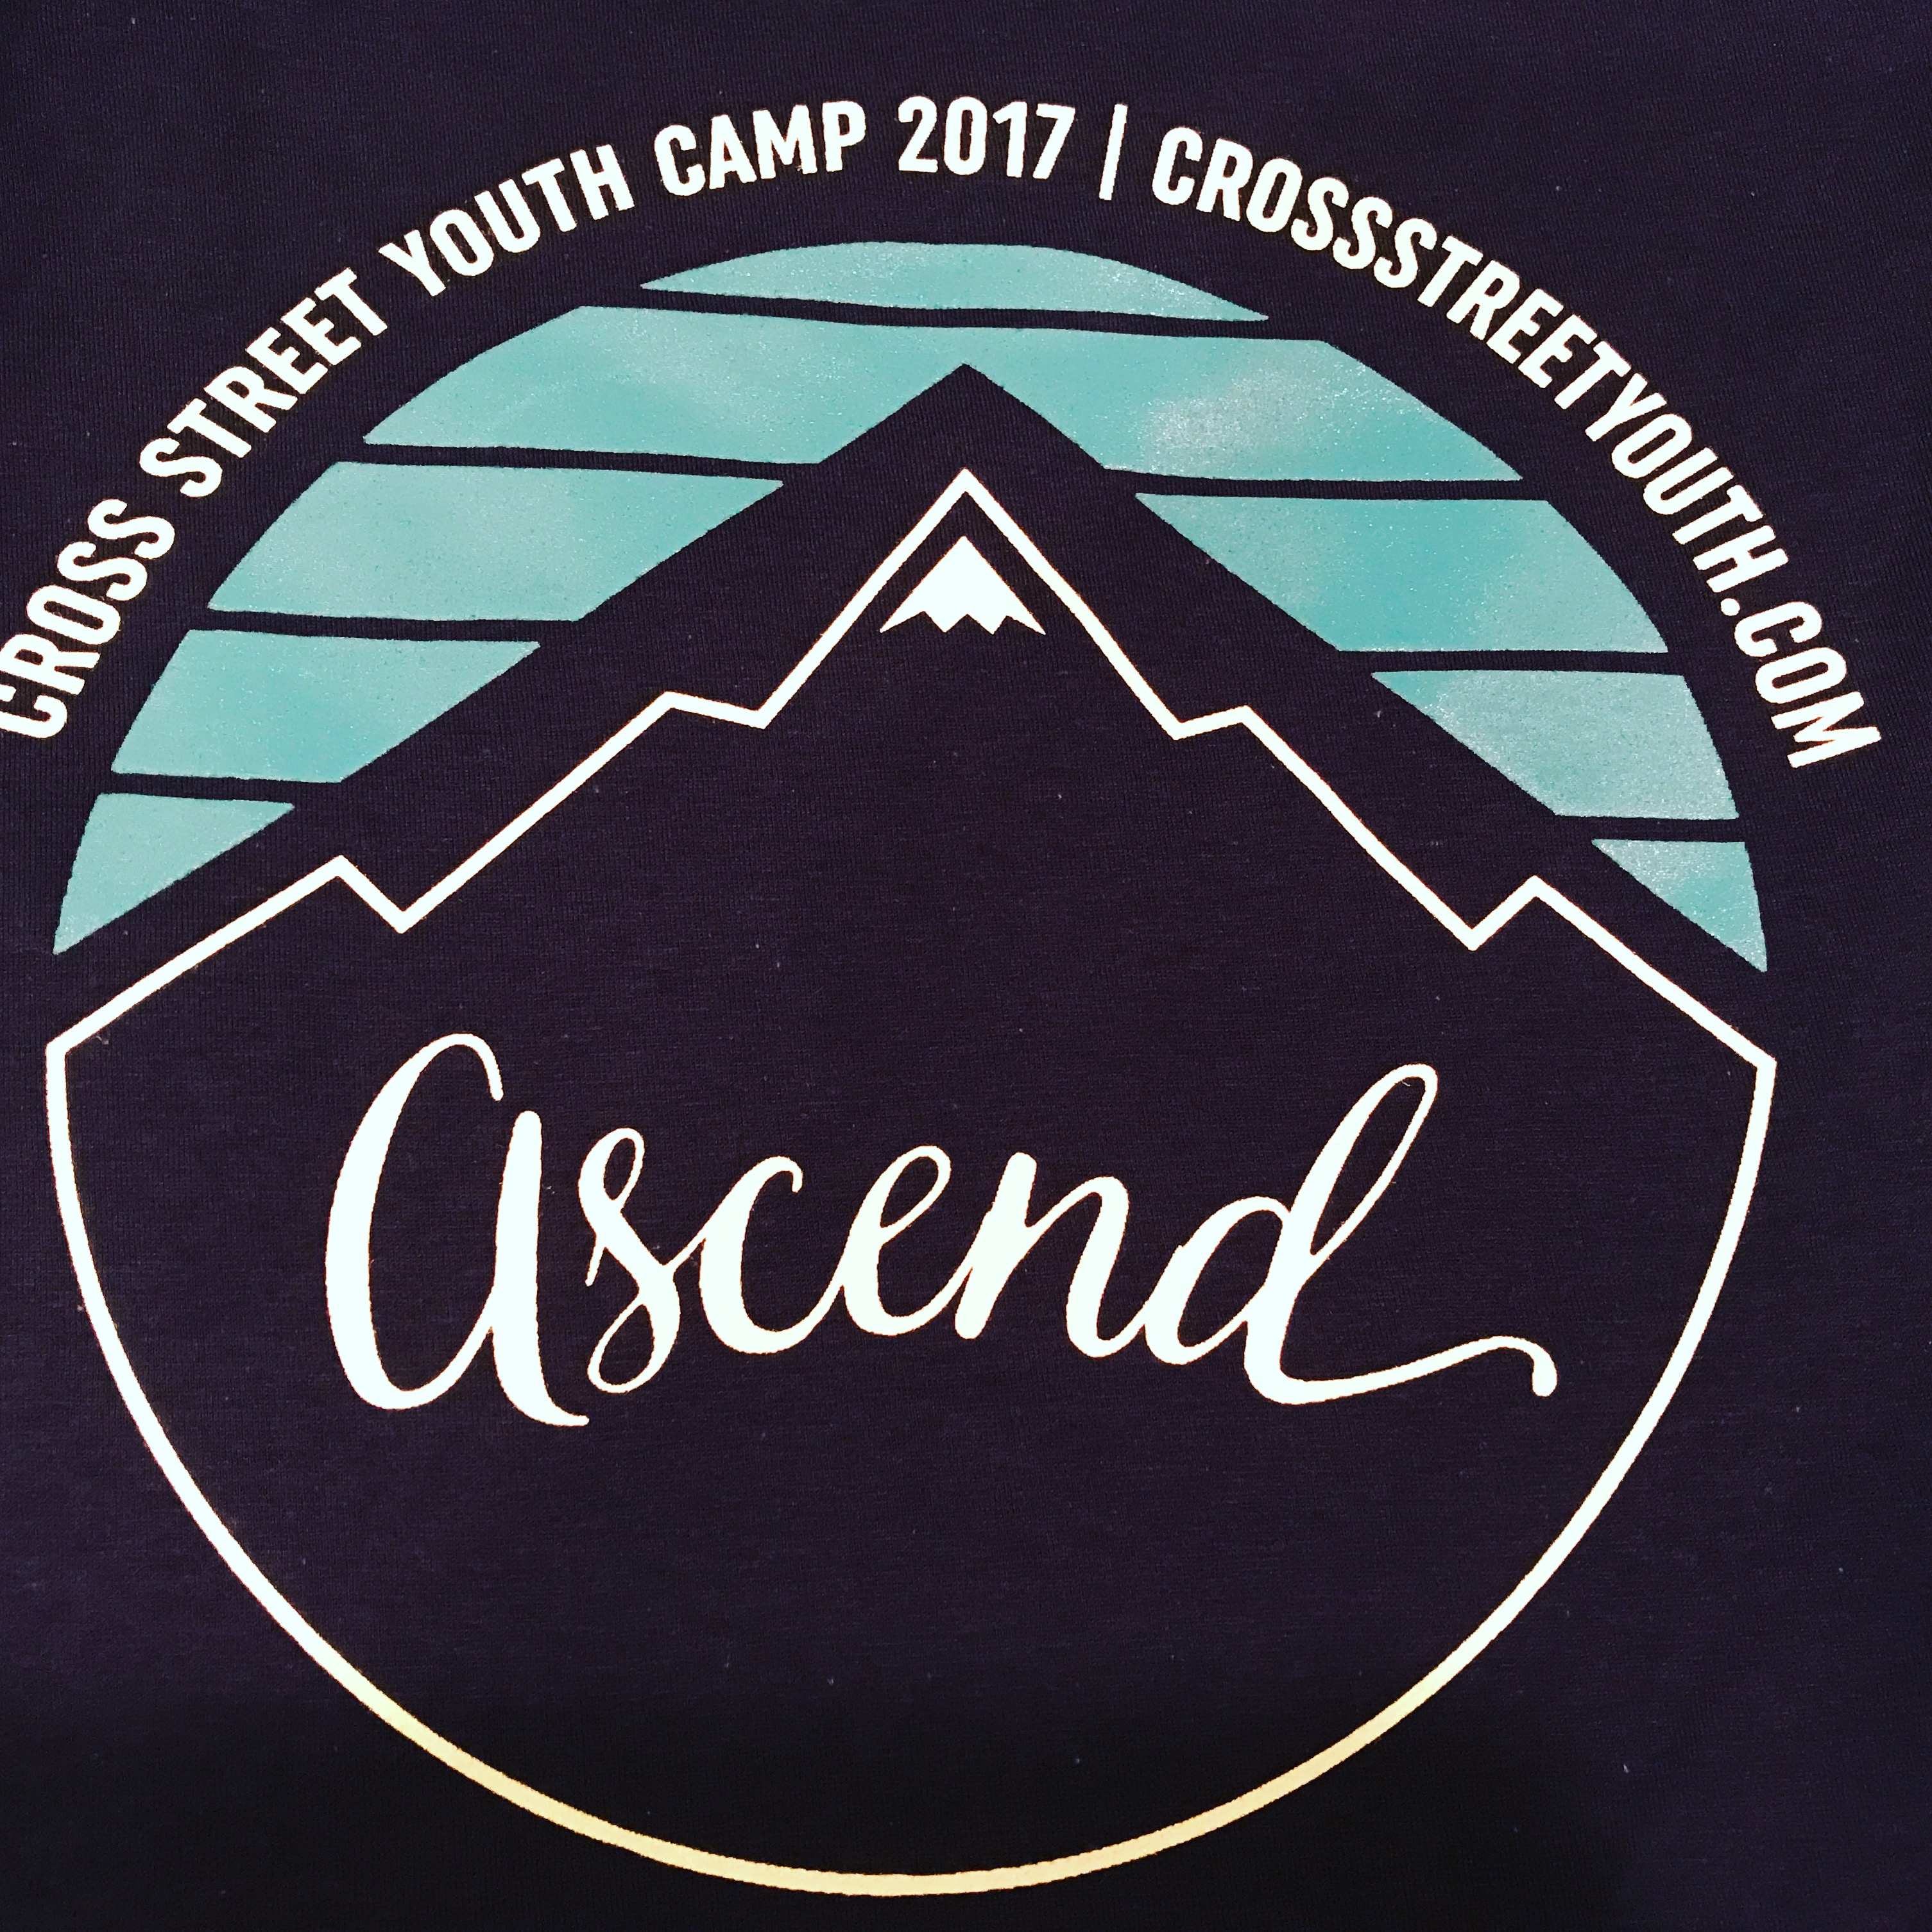 2017-07-16 22.02.41